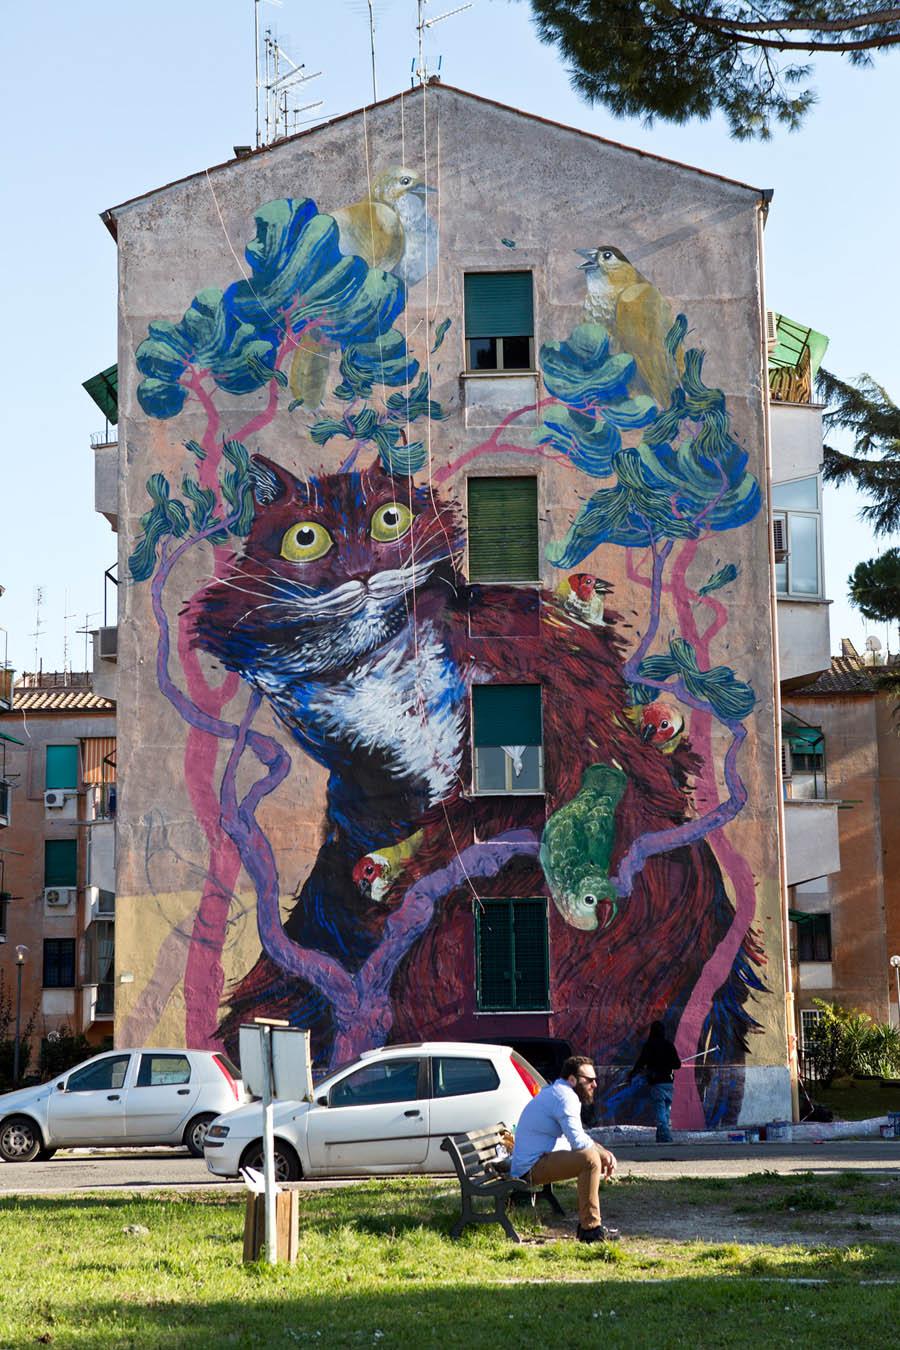 SanBa | San Basilio a ritmo di arte pubblica